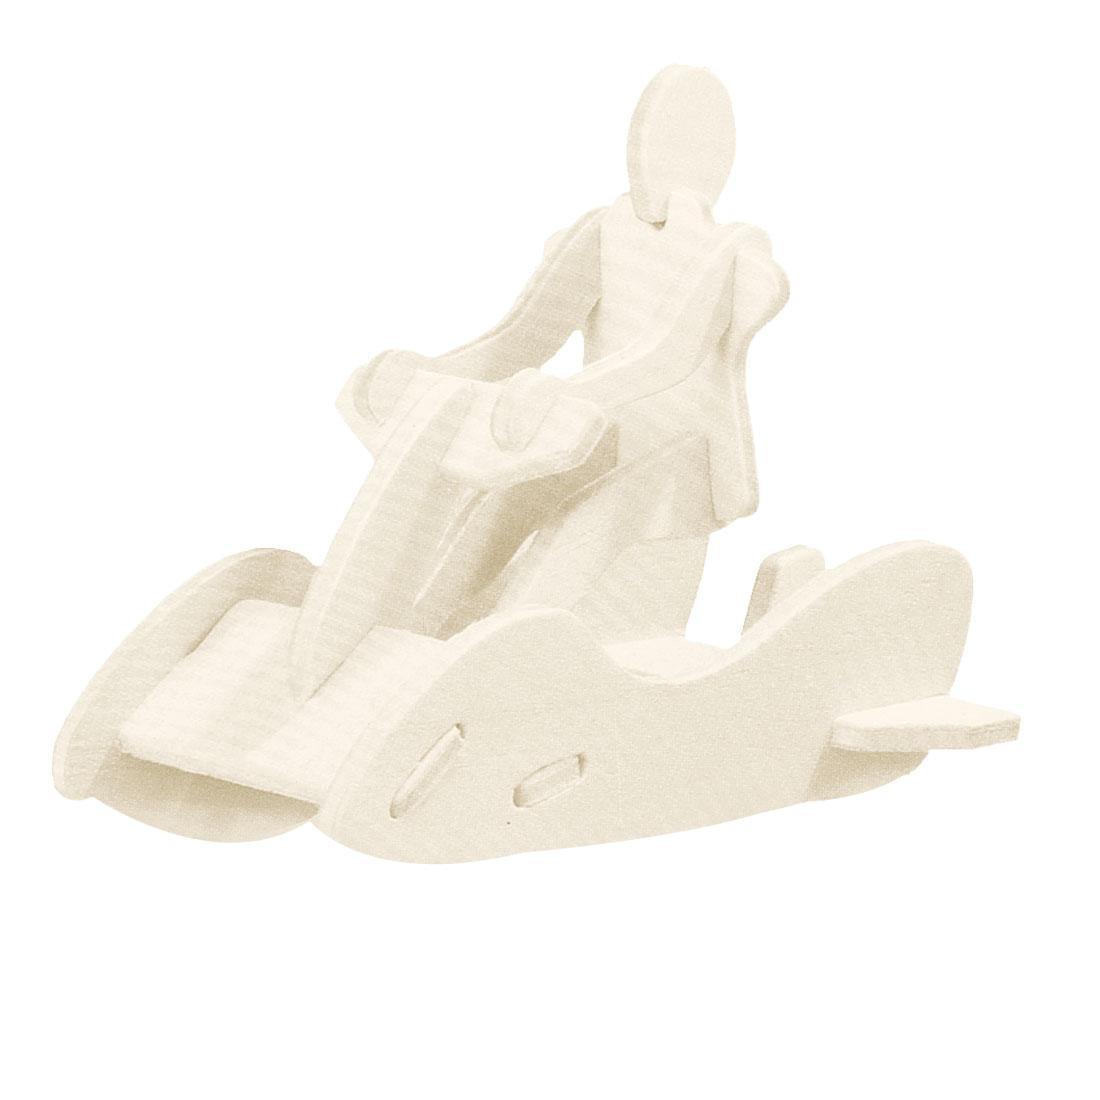 Unique Bargains Children Woodcraft Construction Kit Motorboat Model Educational Puzzle Toy